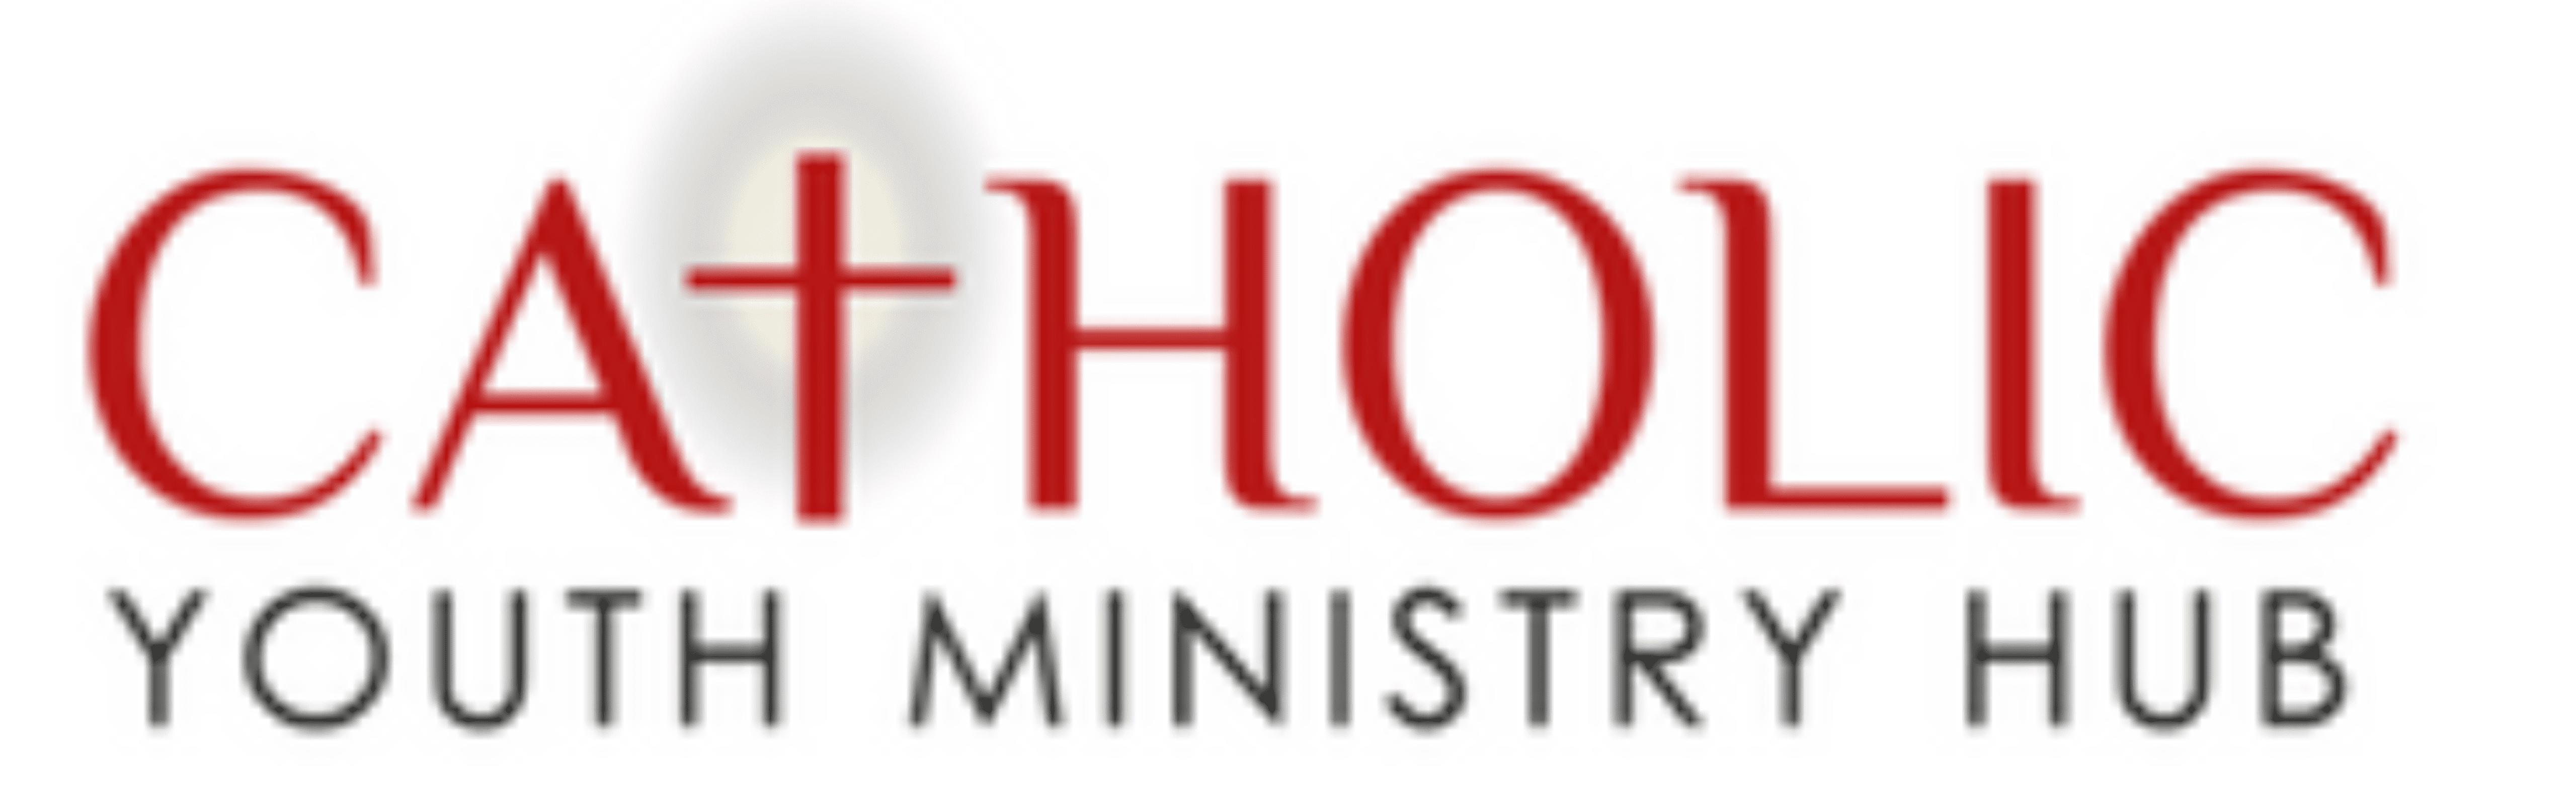 Catholic ministry website banner.